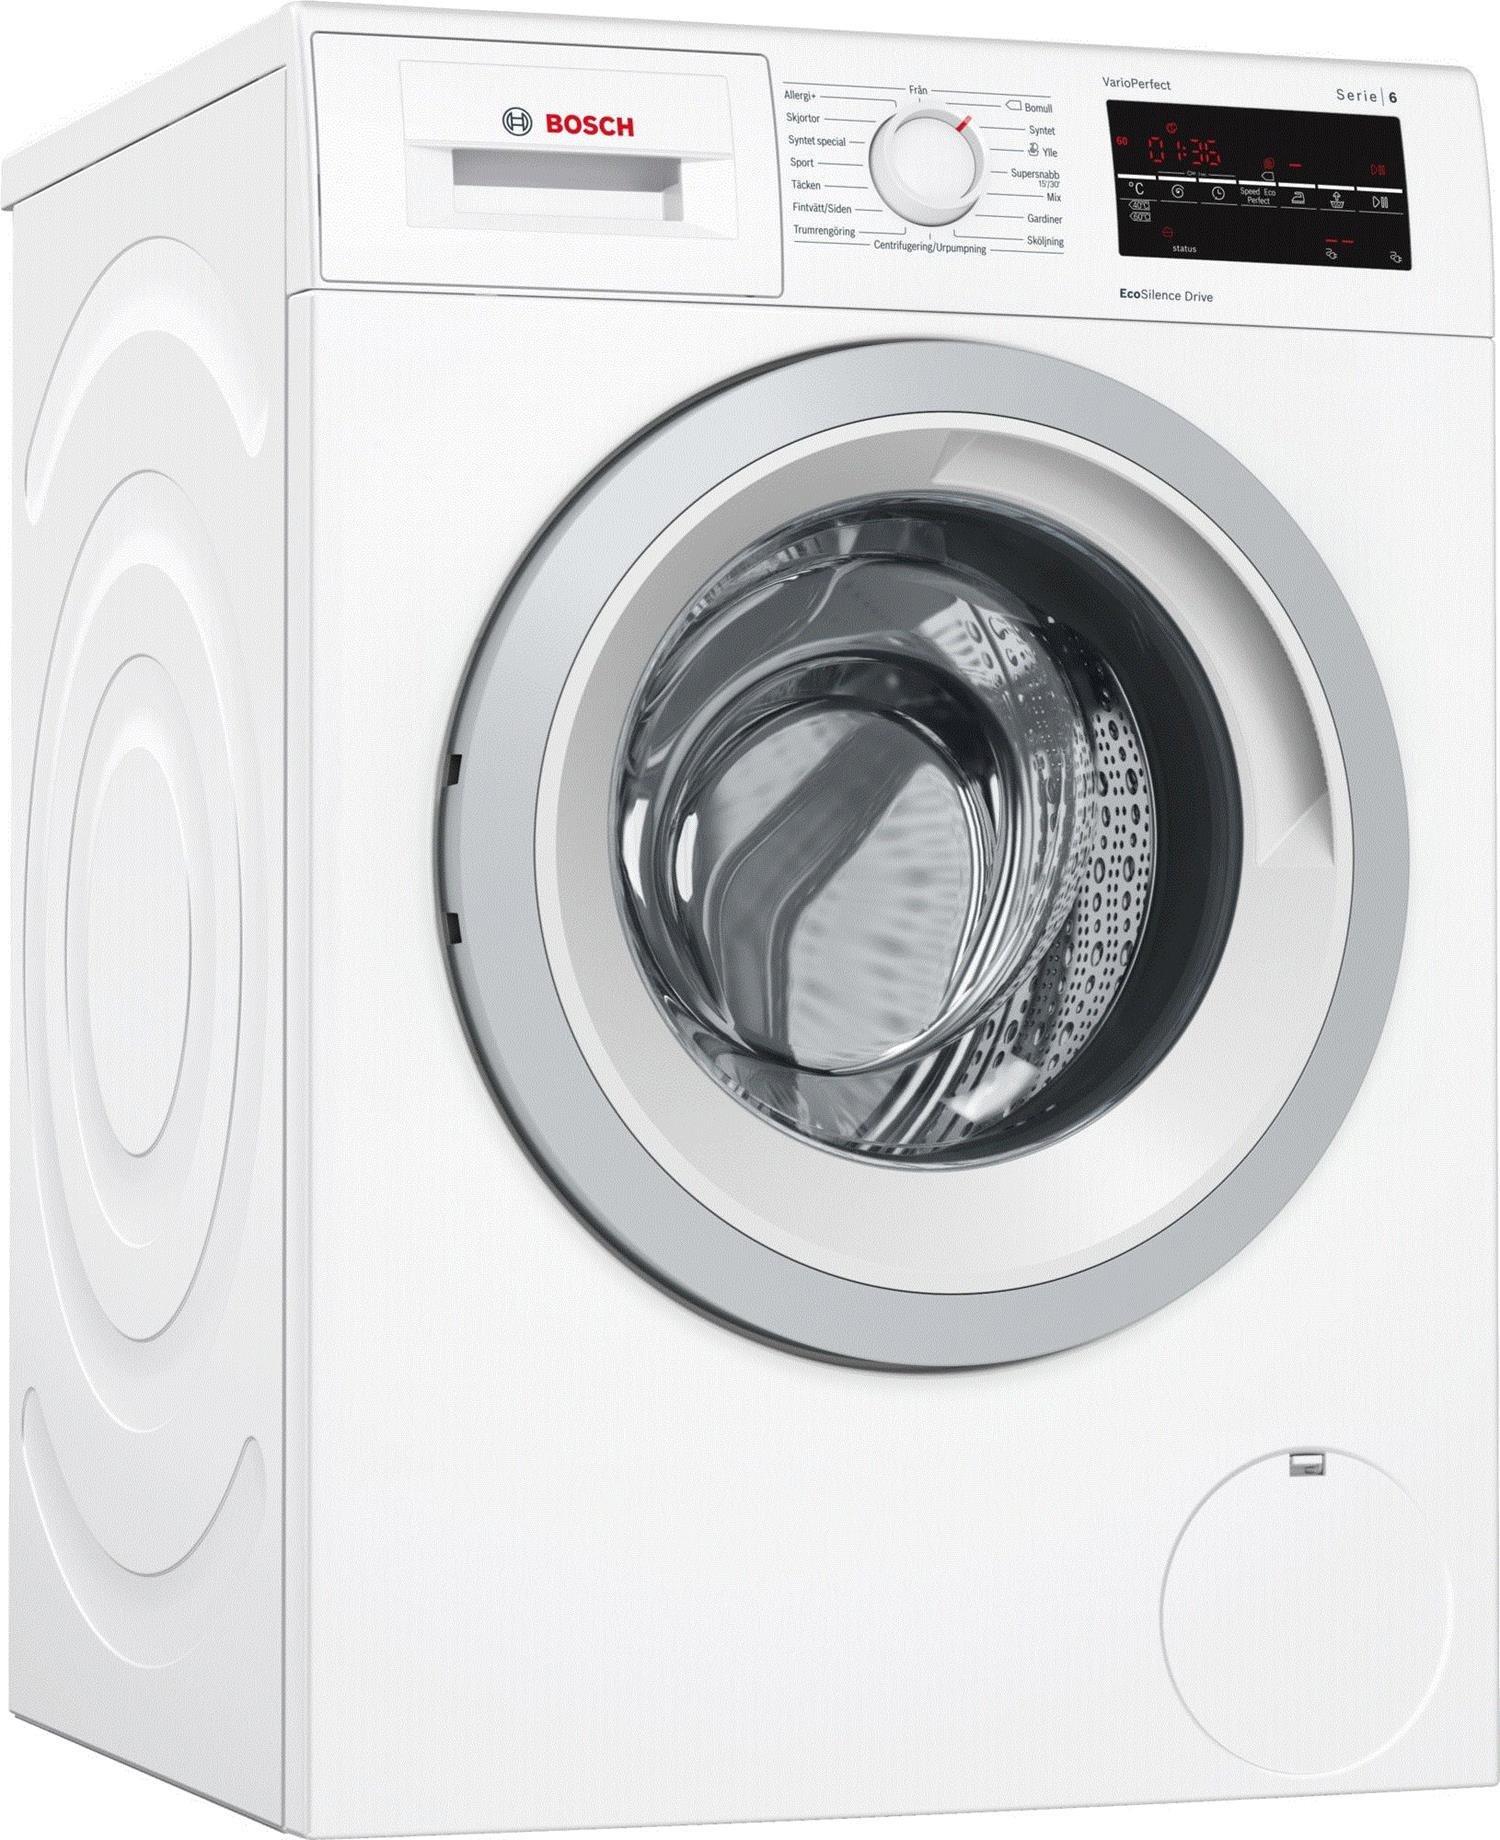 Bosch WAT2849MSN vaskemaskin Kjøp billig